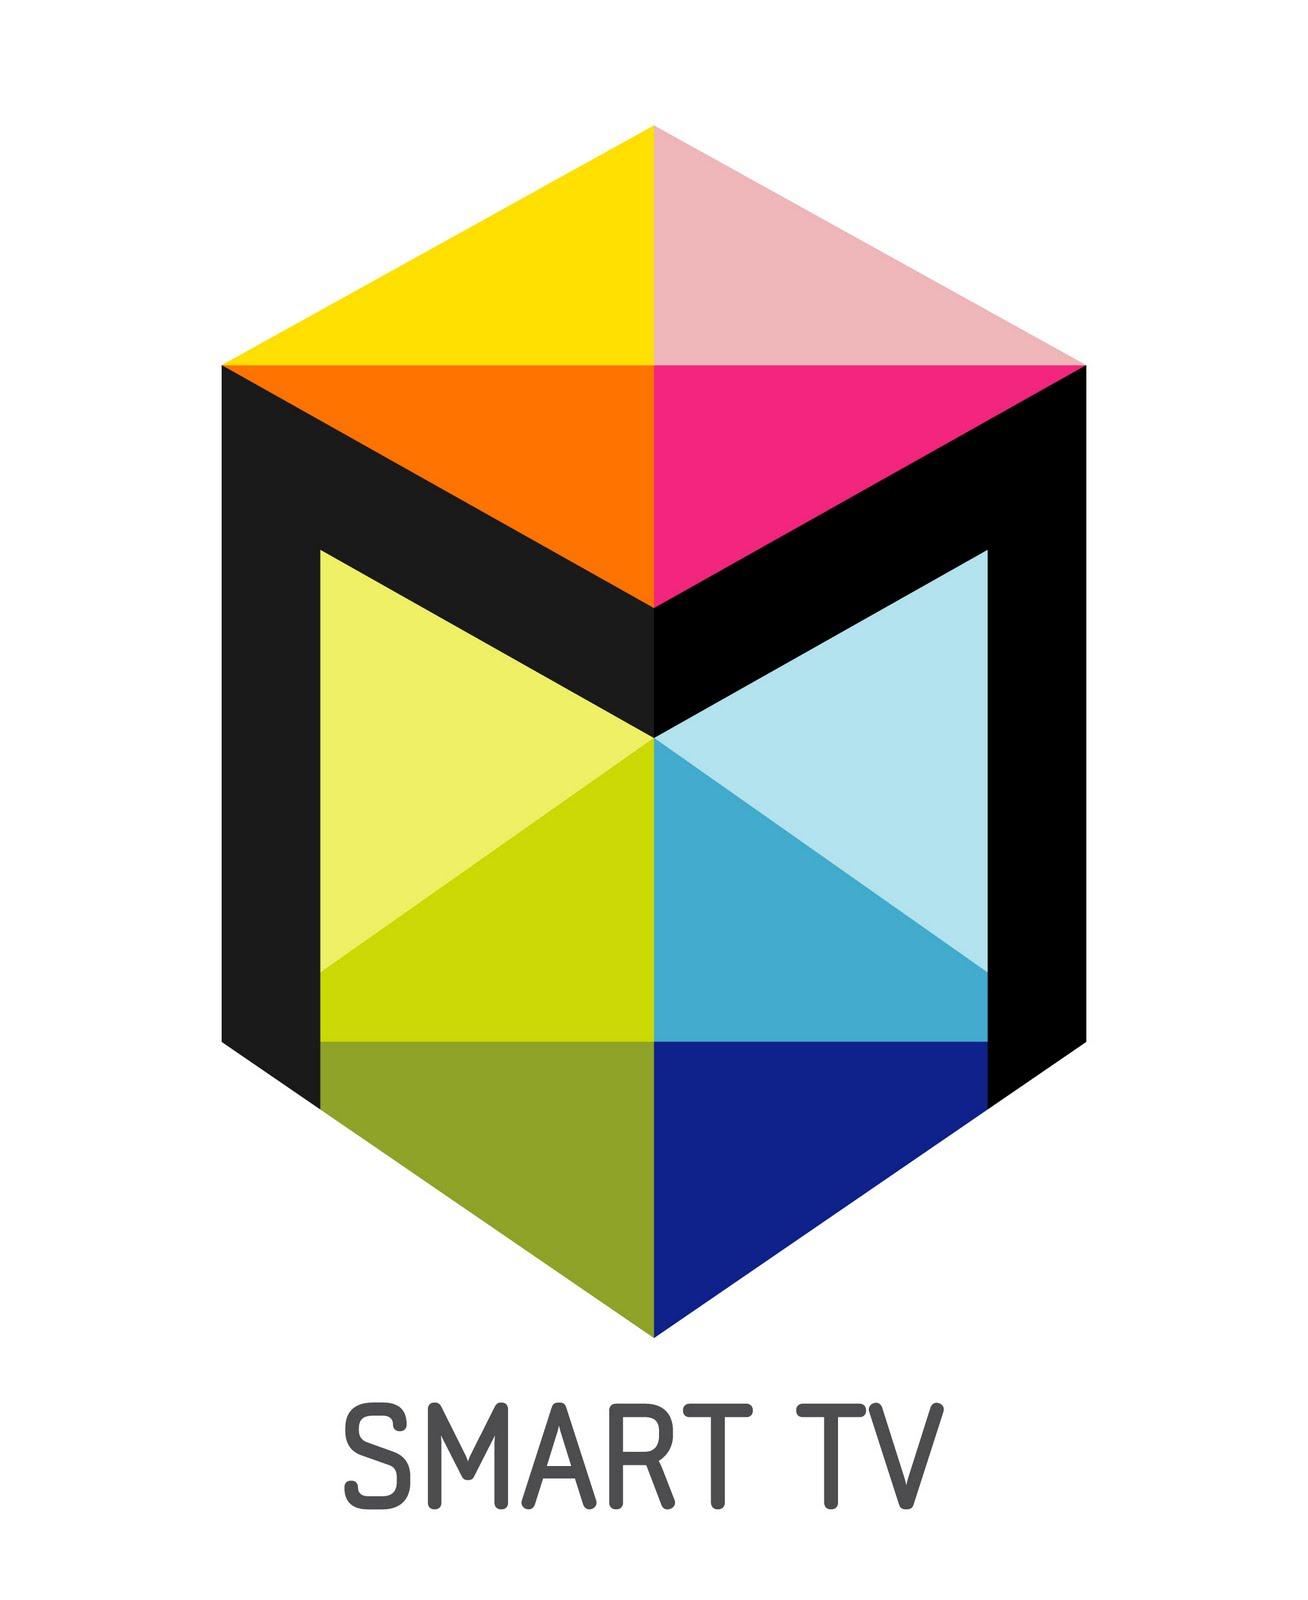 220 Volt Multi System Television Sets Led Lcd Hd 1080p Page 2 Hot Deals Samsung Ua32j4003 Tv 32 Inch All Smart Multisystem Tvs